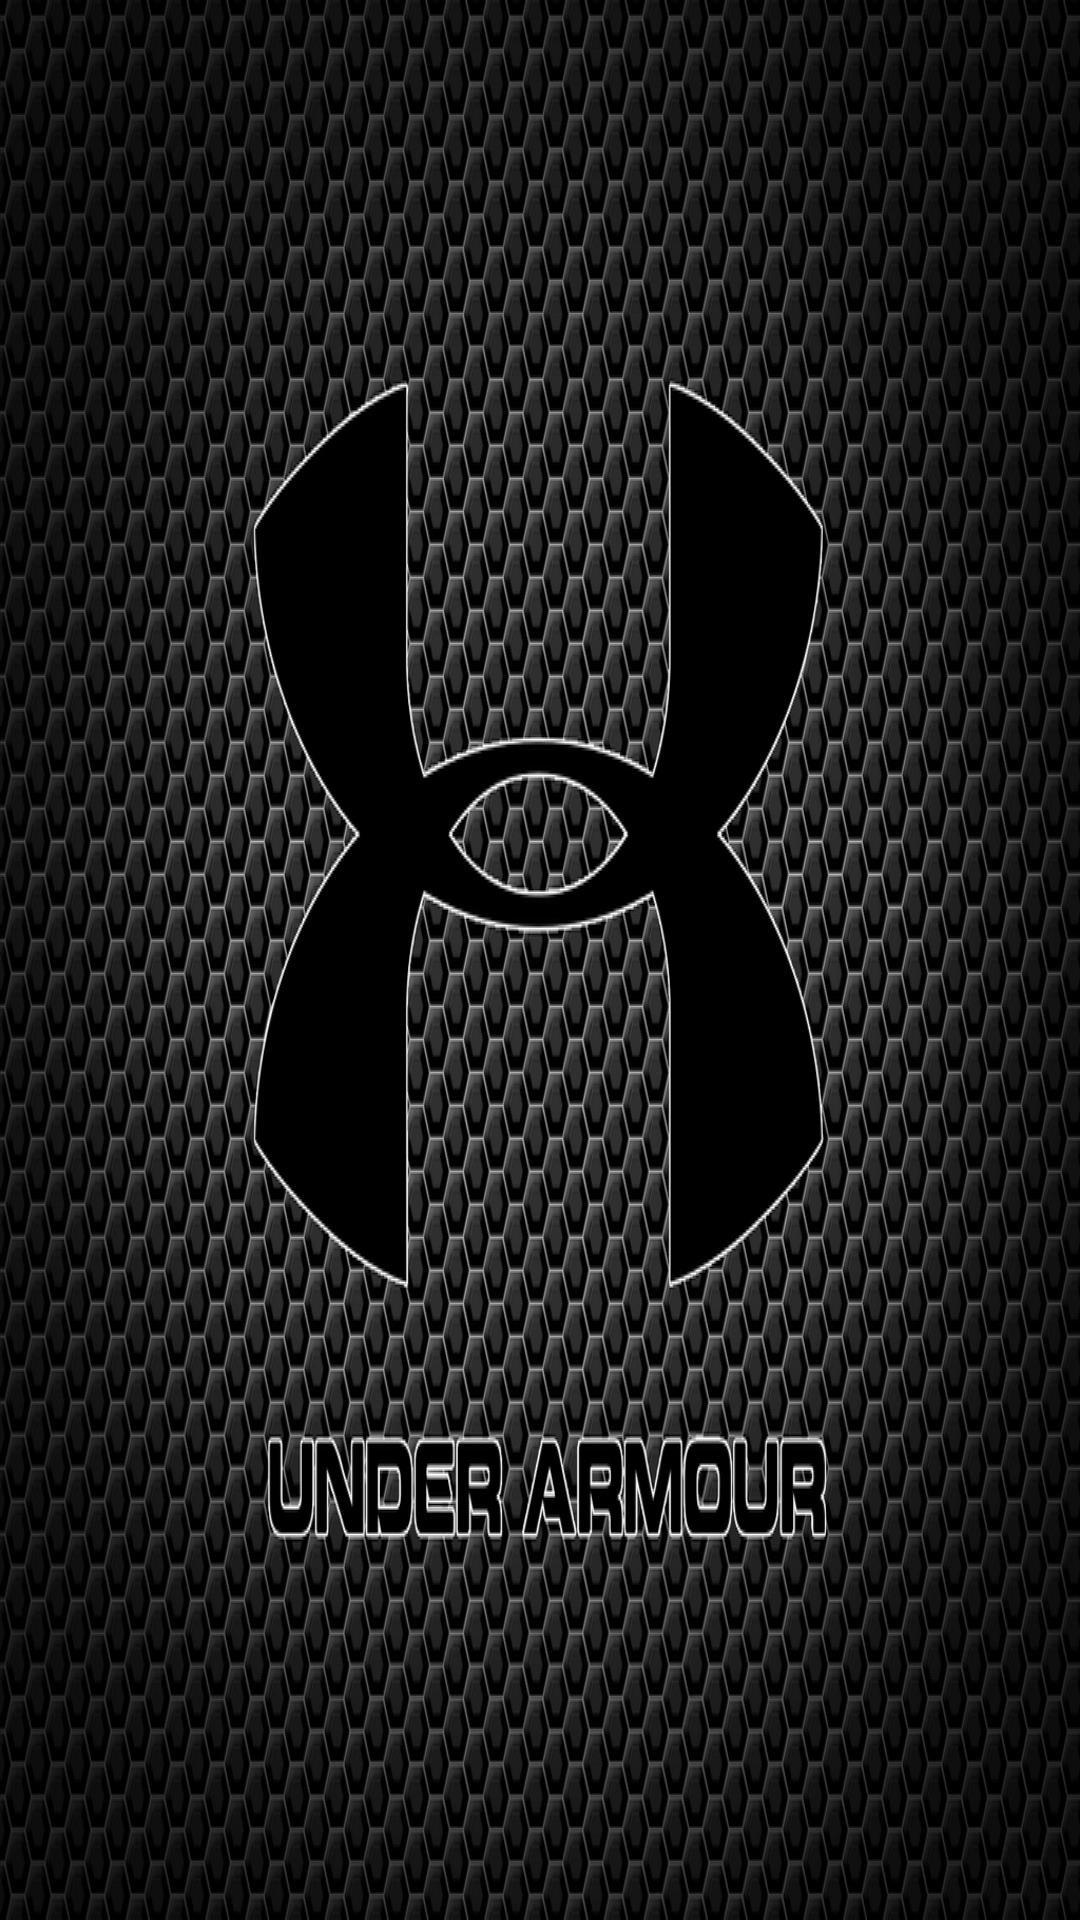 Amazing 10 Under Armour Logo Vector  pamescortscom